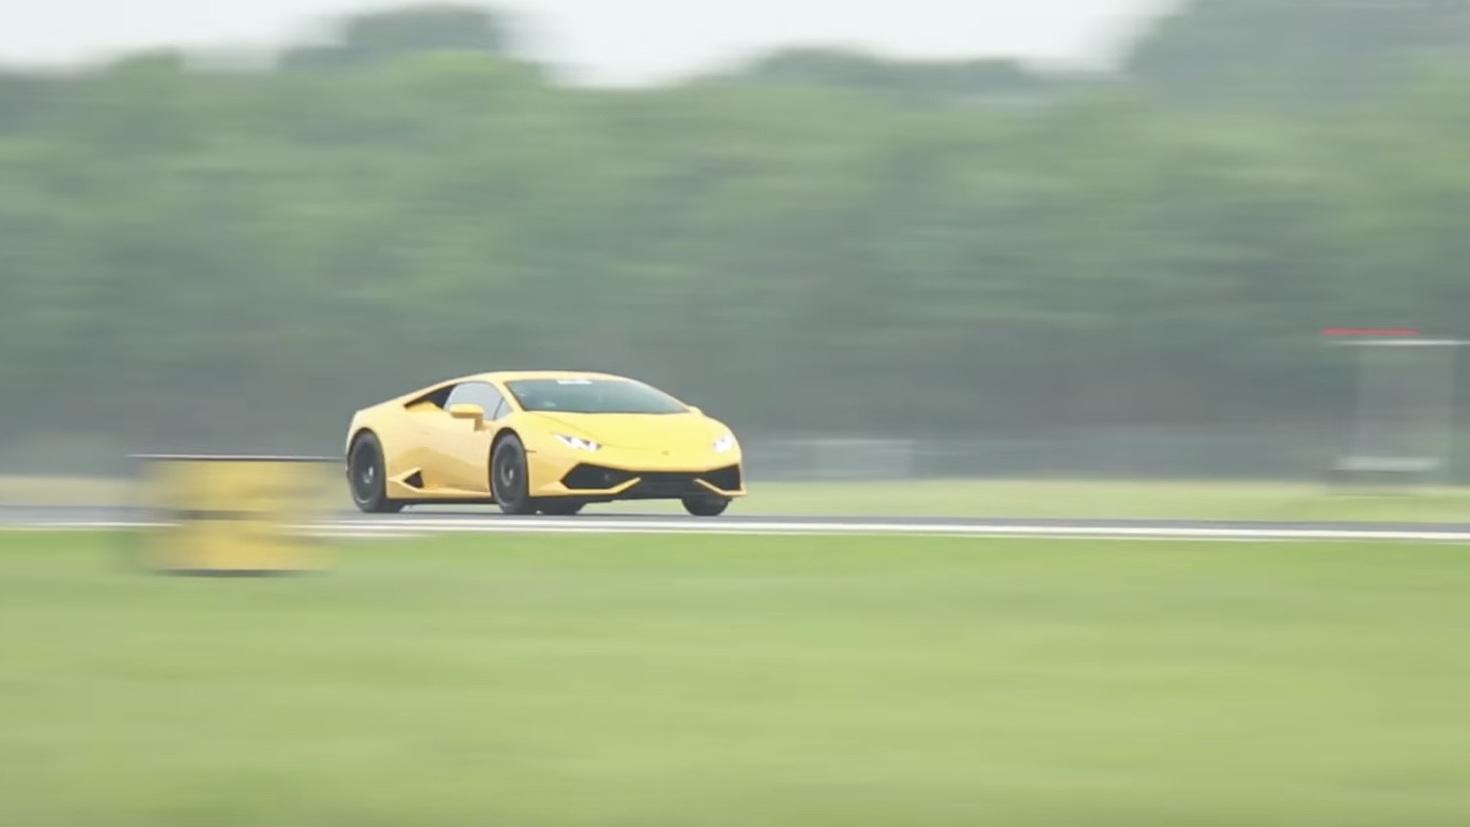 Twin Turbo Lamborghini Huracan Sets New 1 2 Mile World Record Of 250 Mph